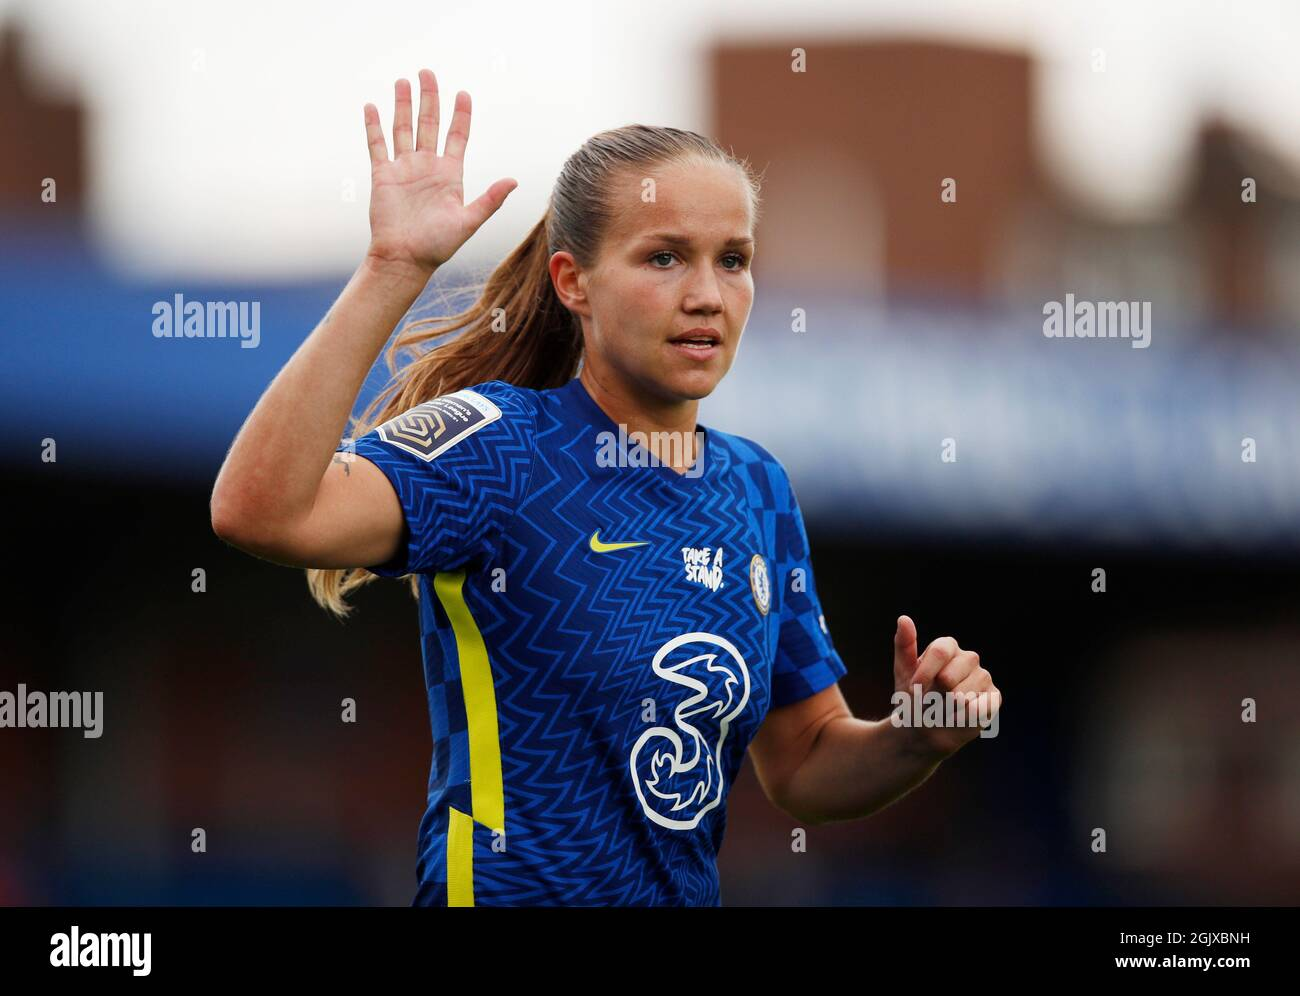 Fútbol - Super Liga Femenina - Chelsea v Everton - Kingsmeadow, Londres, Gran Bretaña - 12 de septiembre de 2021 Chelsea's Guro Reiten Action Images via Reuters/Andrew Boyers Foto de stock